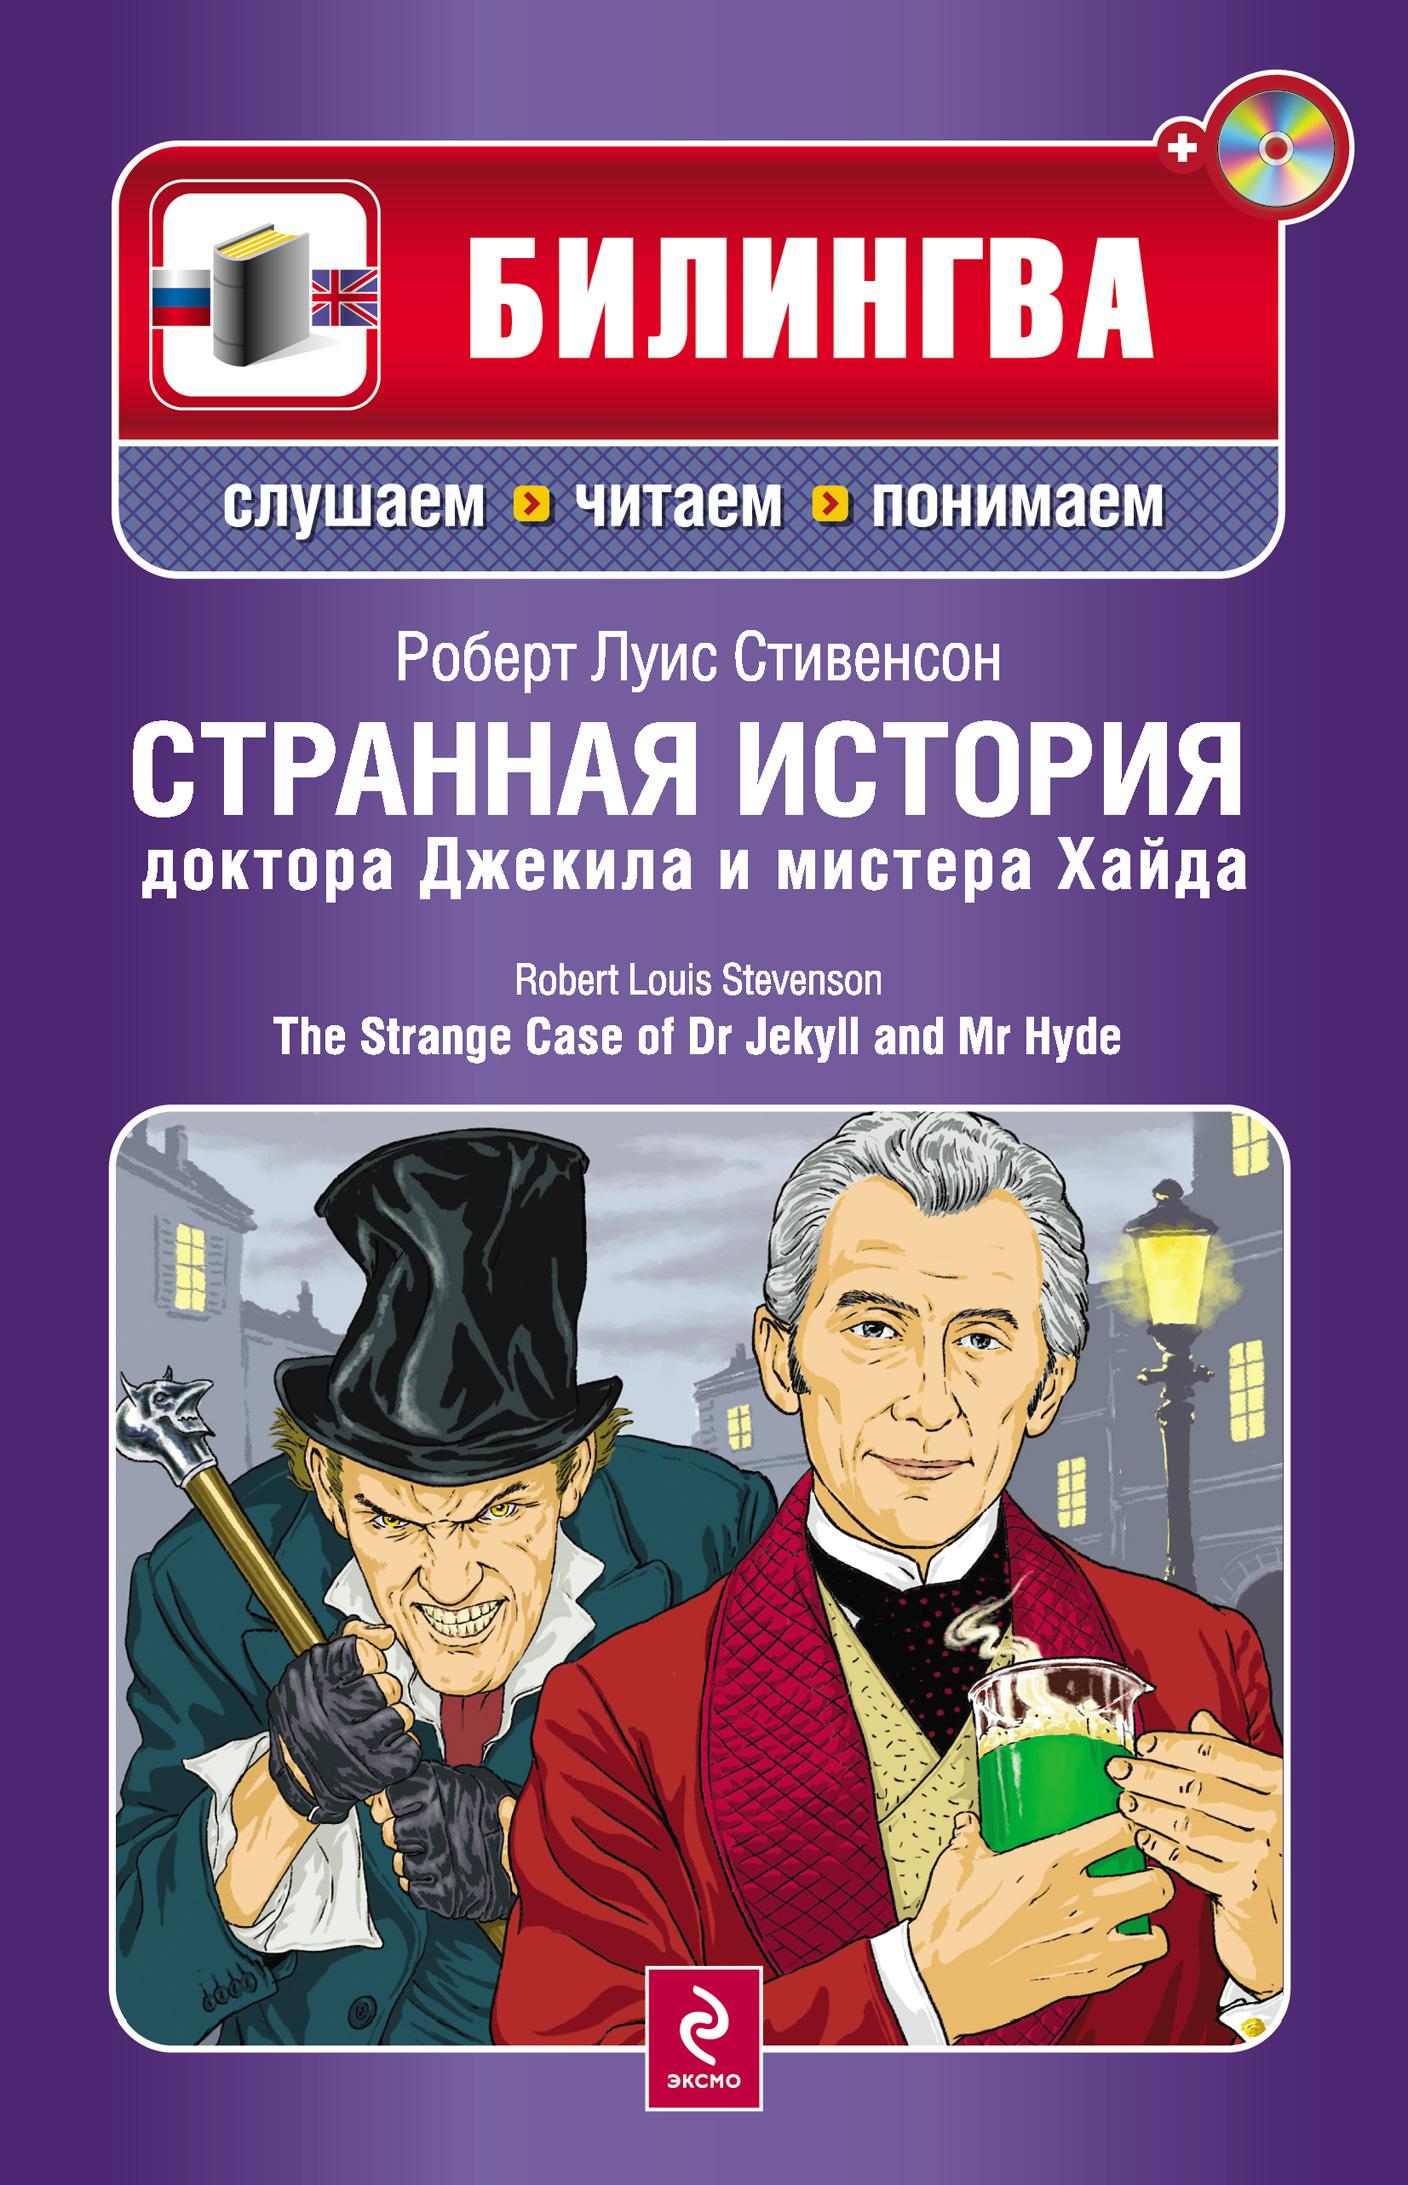 Роберт Льюис Стивенсон Странная история доктора Джекила и мистера Хайда / The Strange Case of Dr Jekyll and Mr Hyde (+MP3)